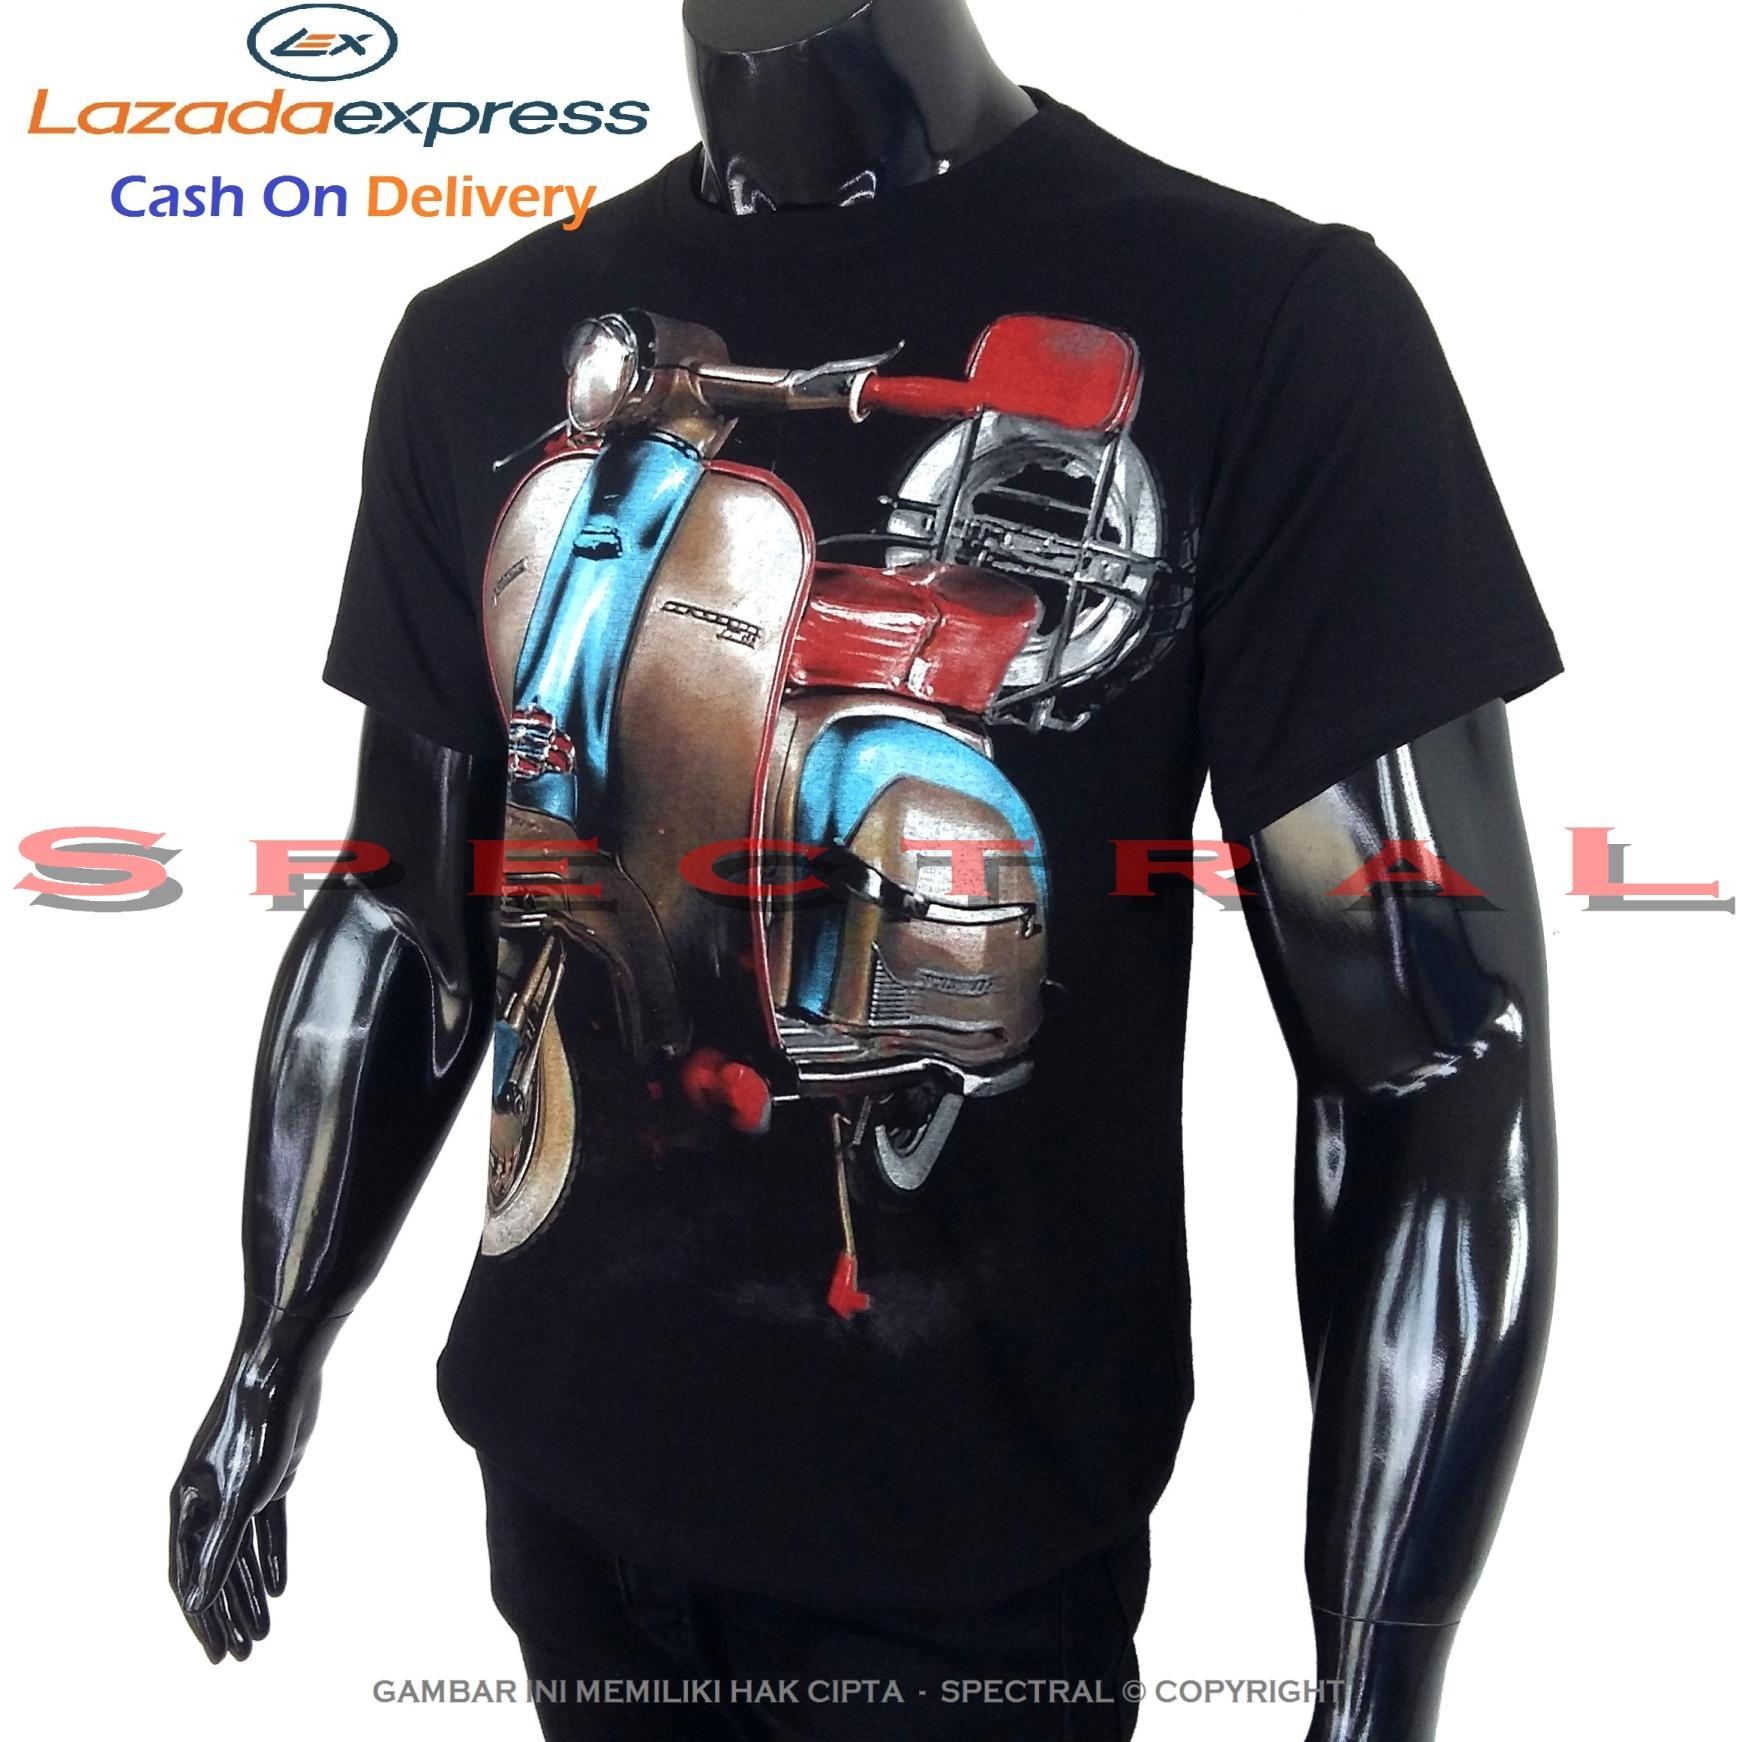 Spectral – MOTOR VESPA 100% Cotton Combed 30s Kaos Distro Fashion T-Shirt Atasan Terbaru Baju Pakaian Polos Pria Wanita Cewe Cowo Lengan Murah Bagus Keren Jaman Kekinian Jakarta Bandung Gambar Otomotif Mobil Sepeda Kendaraan Bus Balap Racing